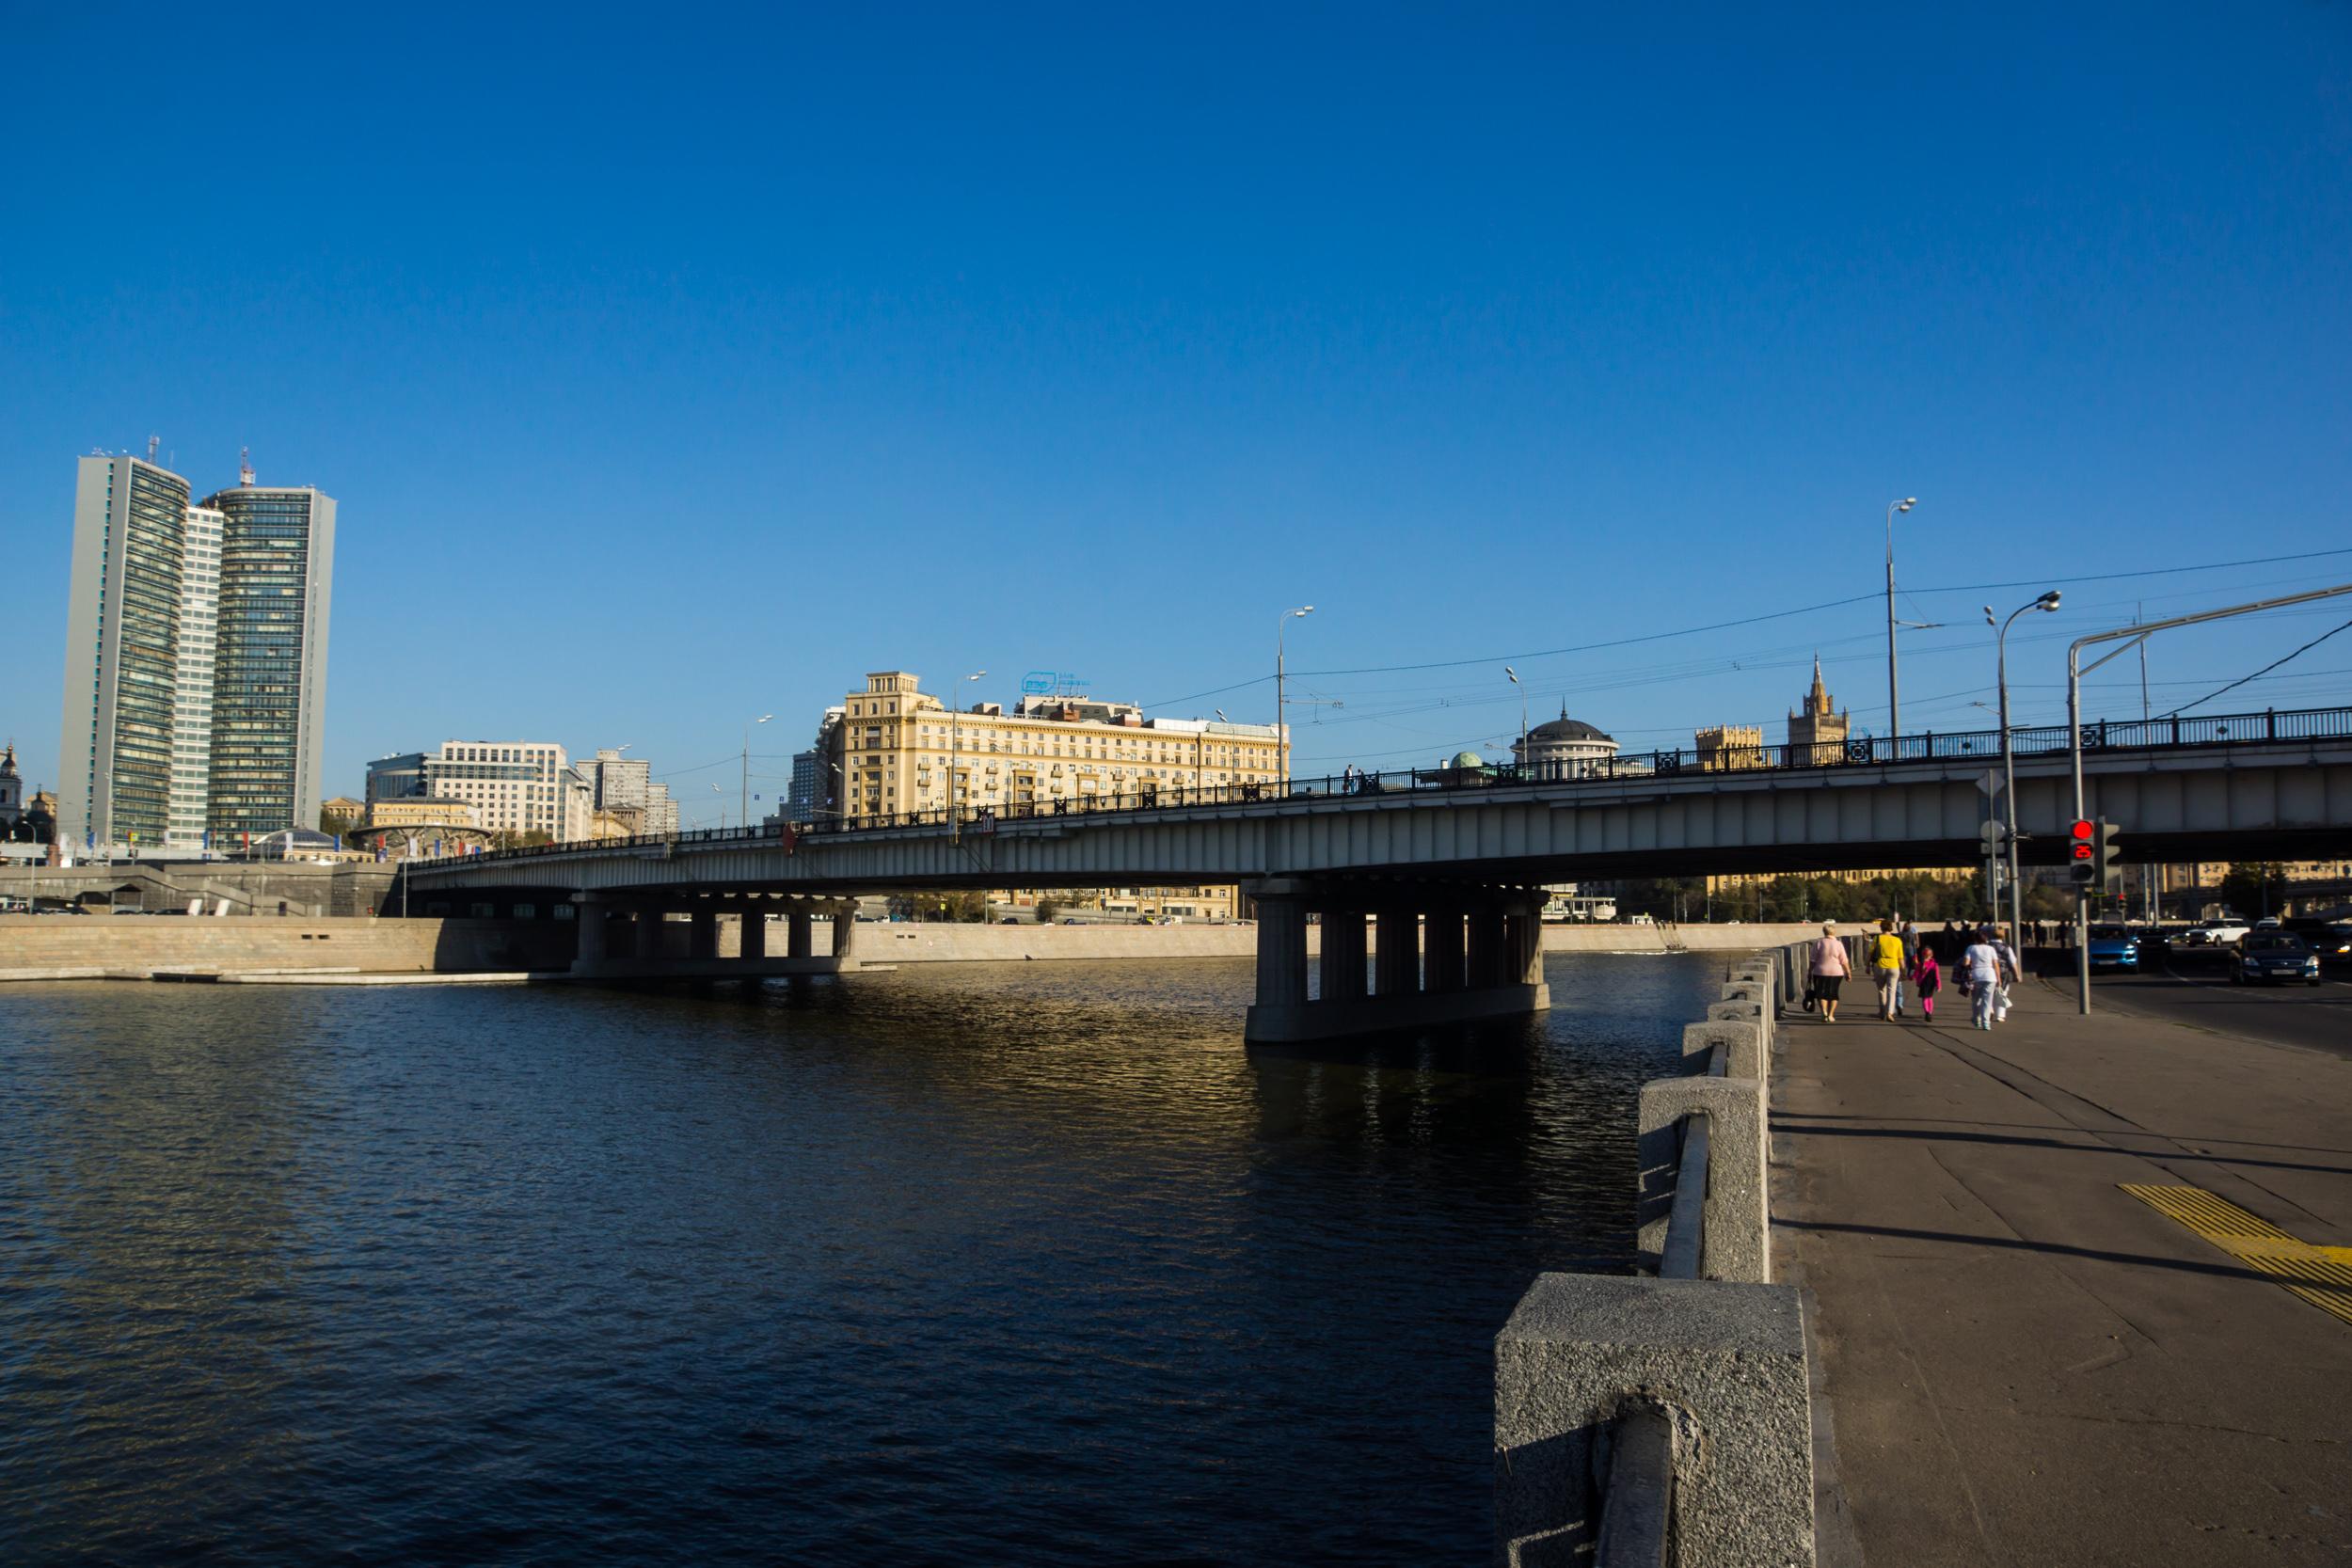 Вид на Новоарбатский мост и здание СЭВ